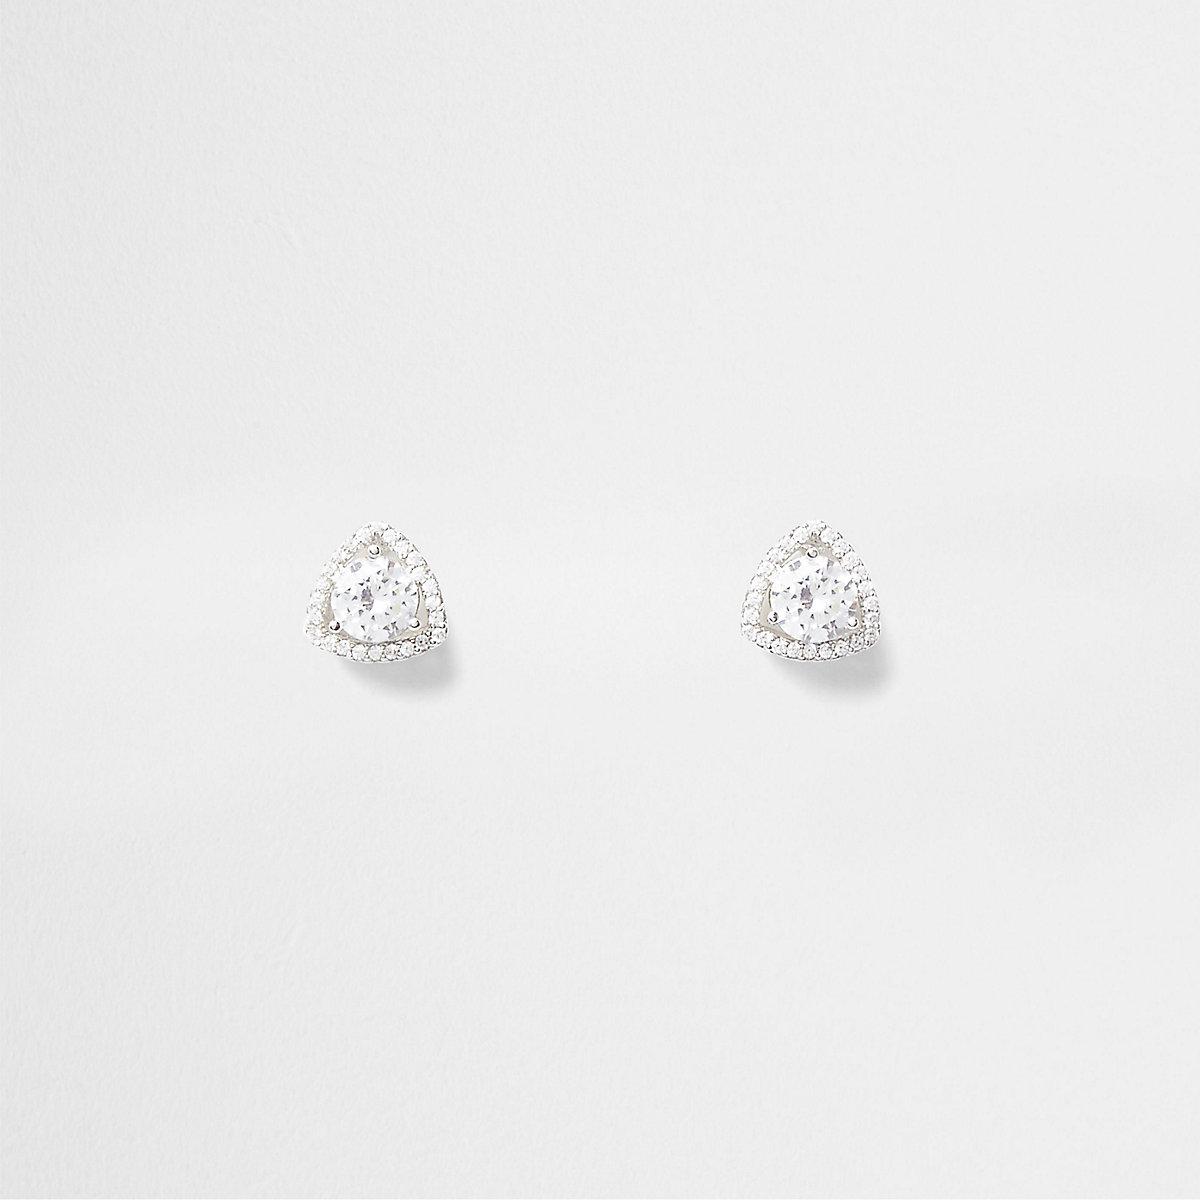 Silver tone triangle cubic zirconia earrings